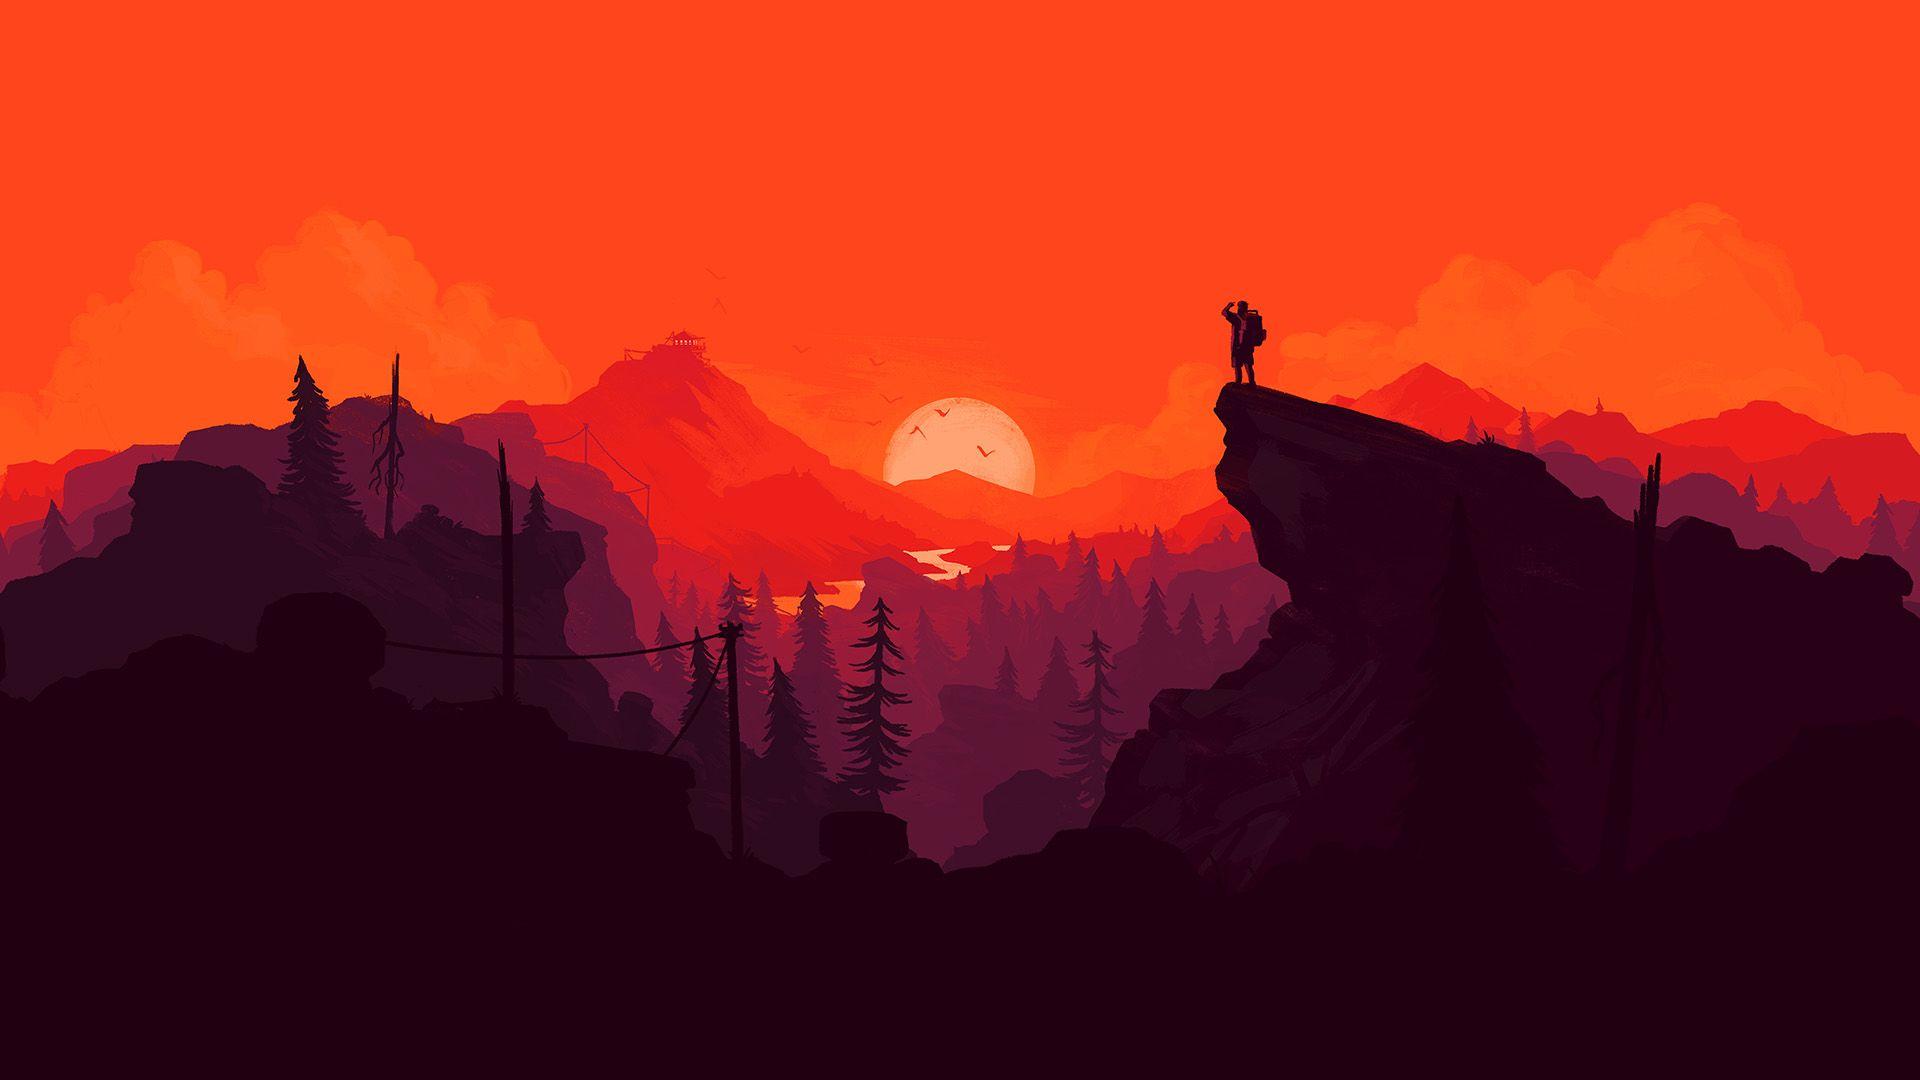 Background Firewatch Art, Landscape, Minimalism